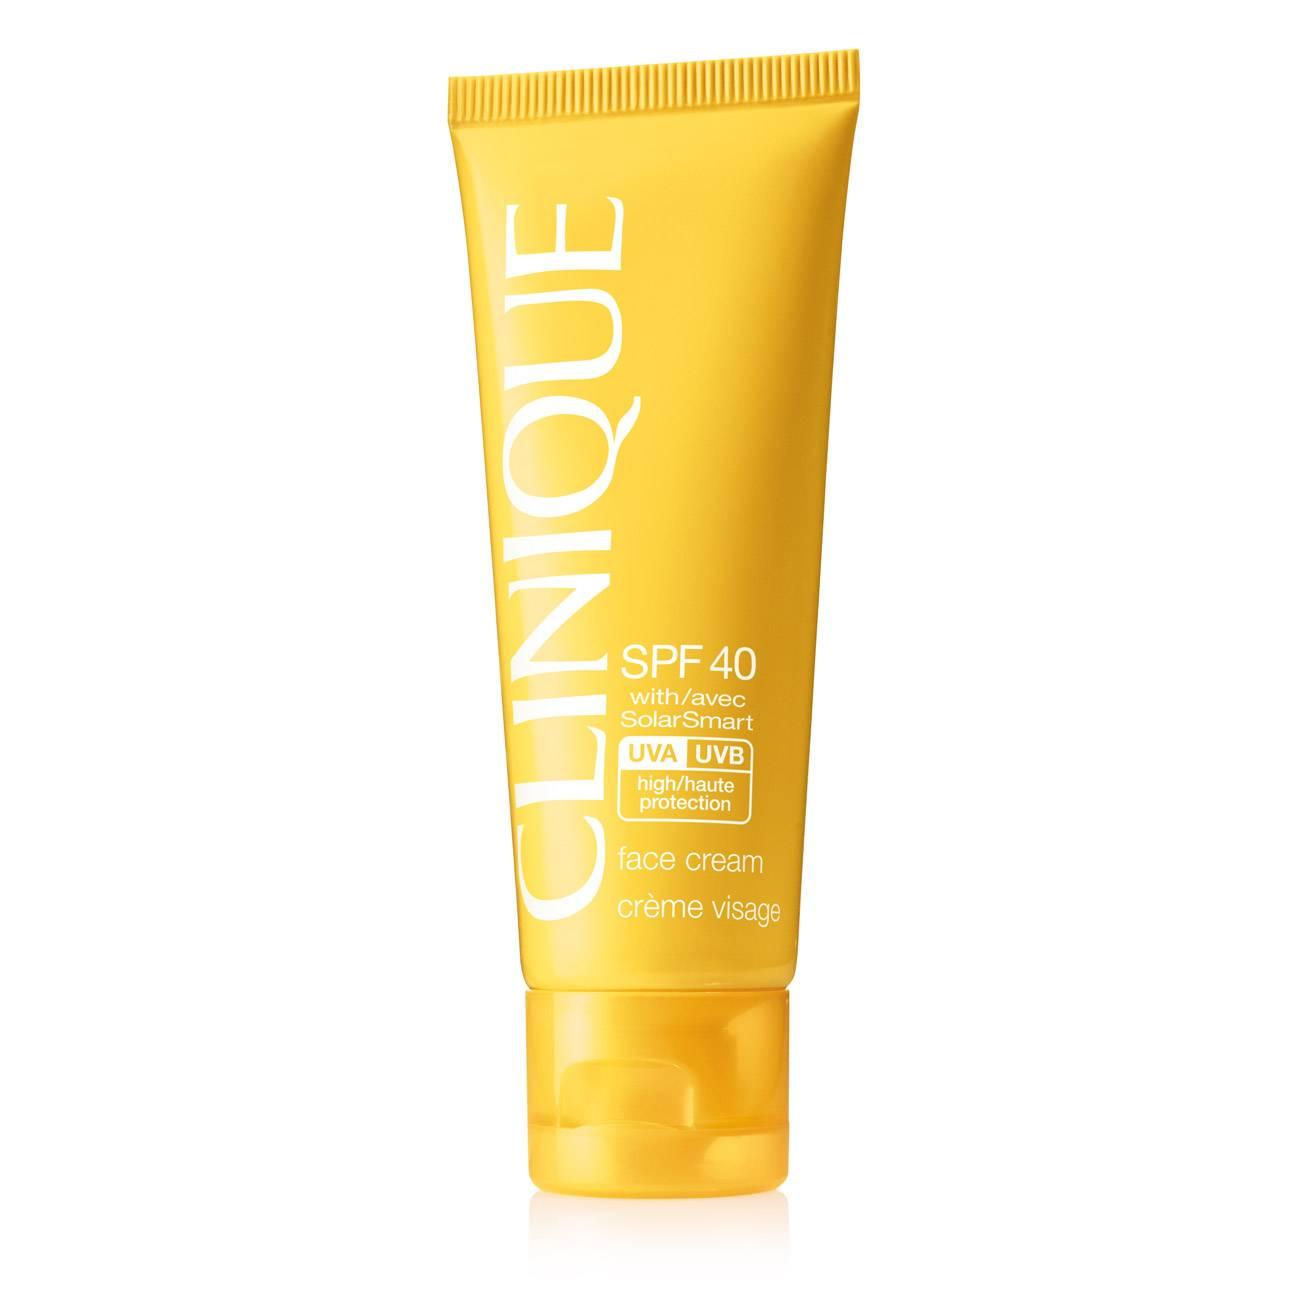 Sun Face Cream 50 Ml Clinique imagine 2021 bestvalue.eu